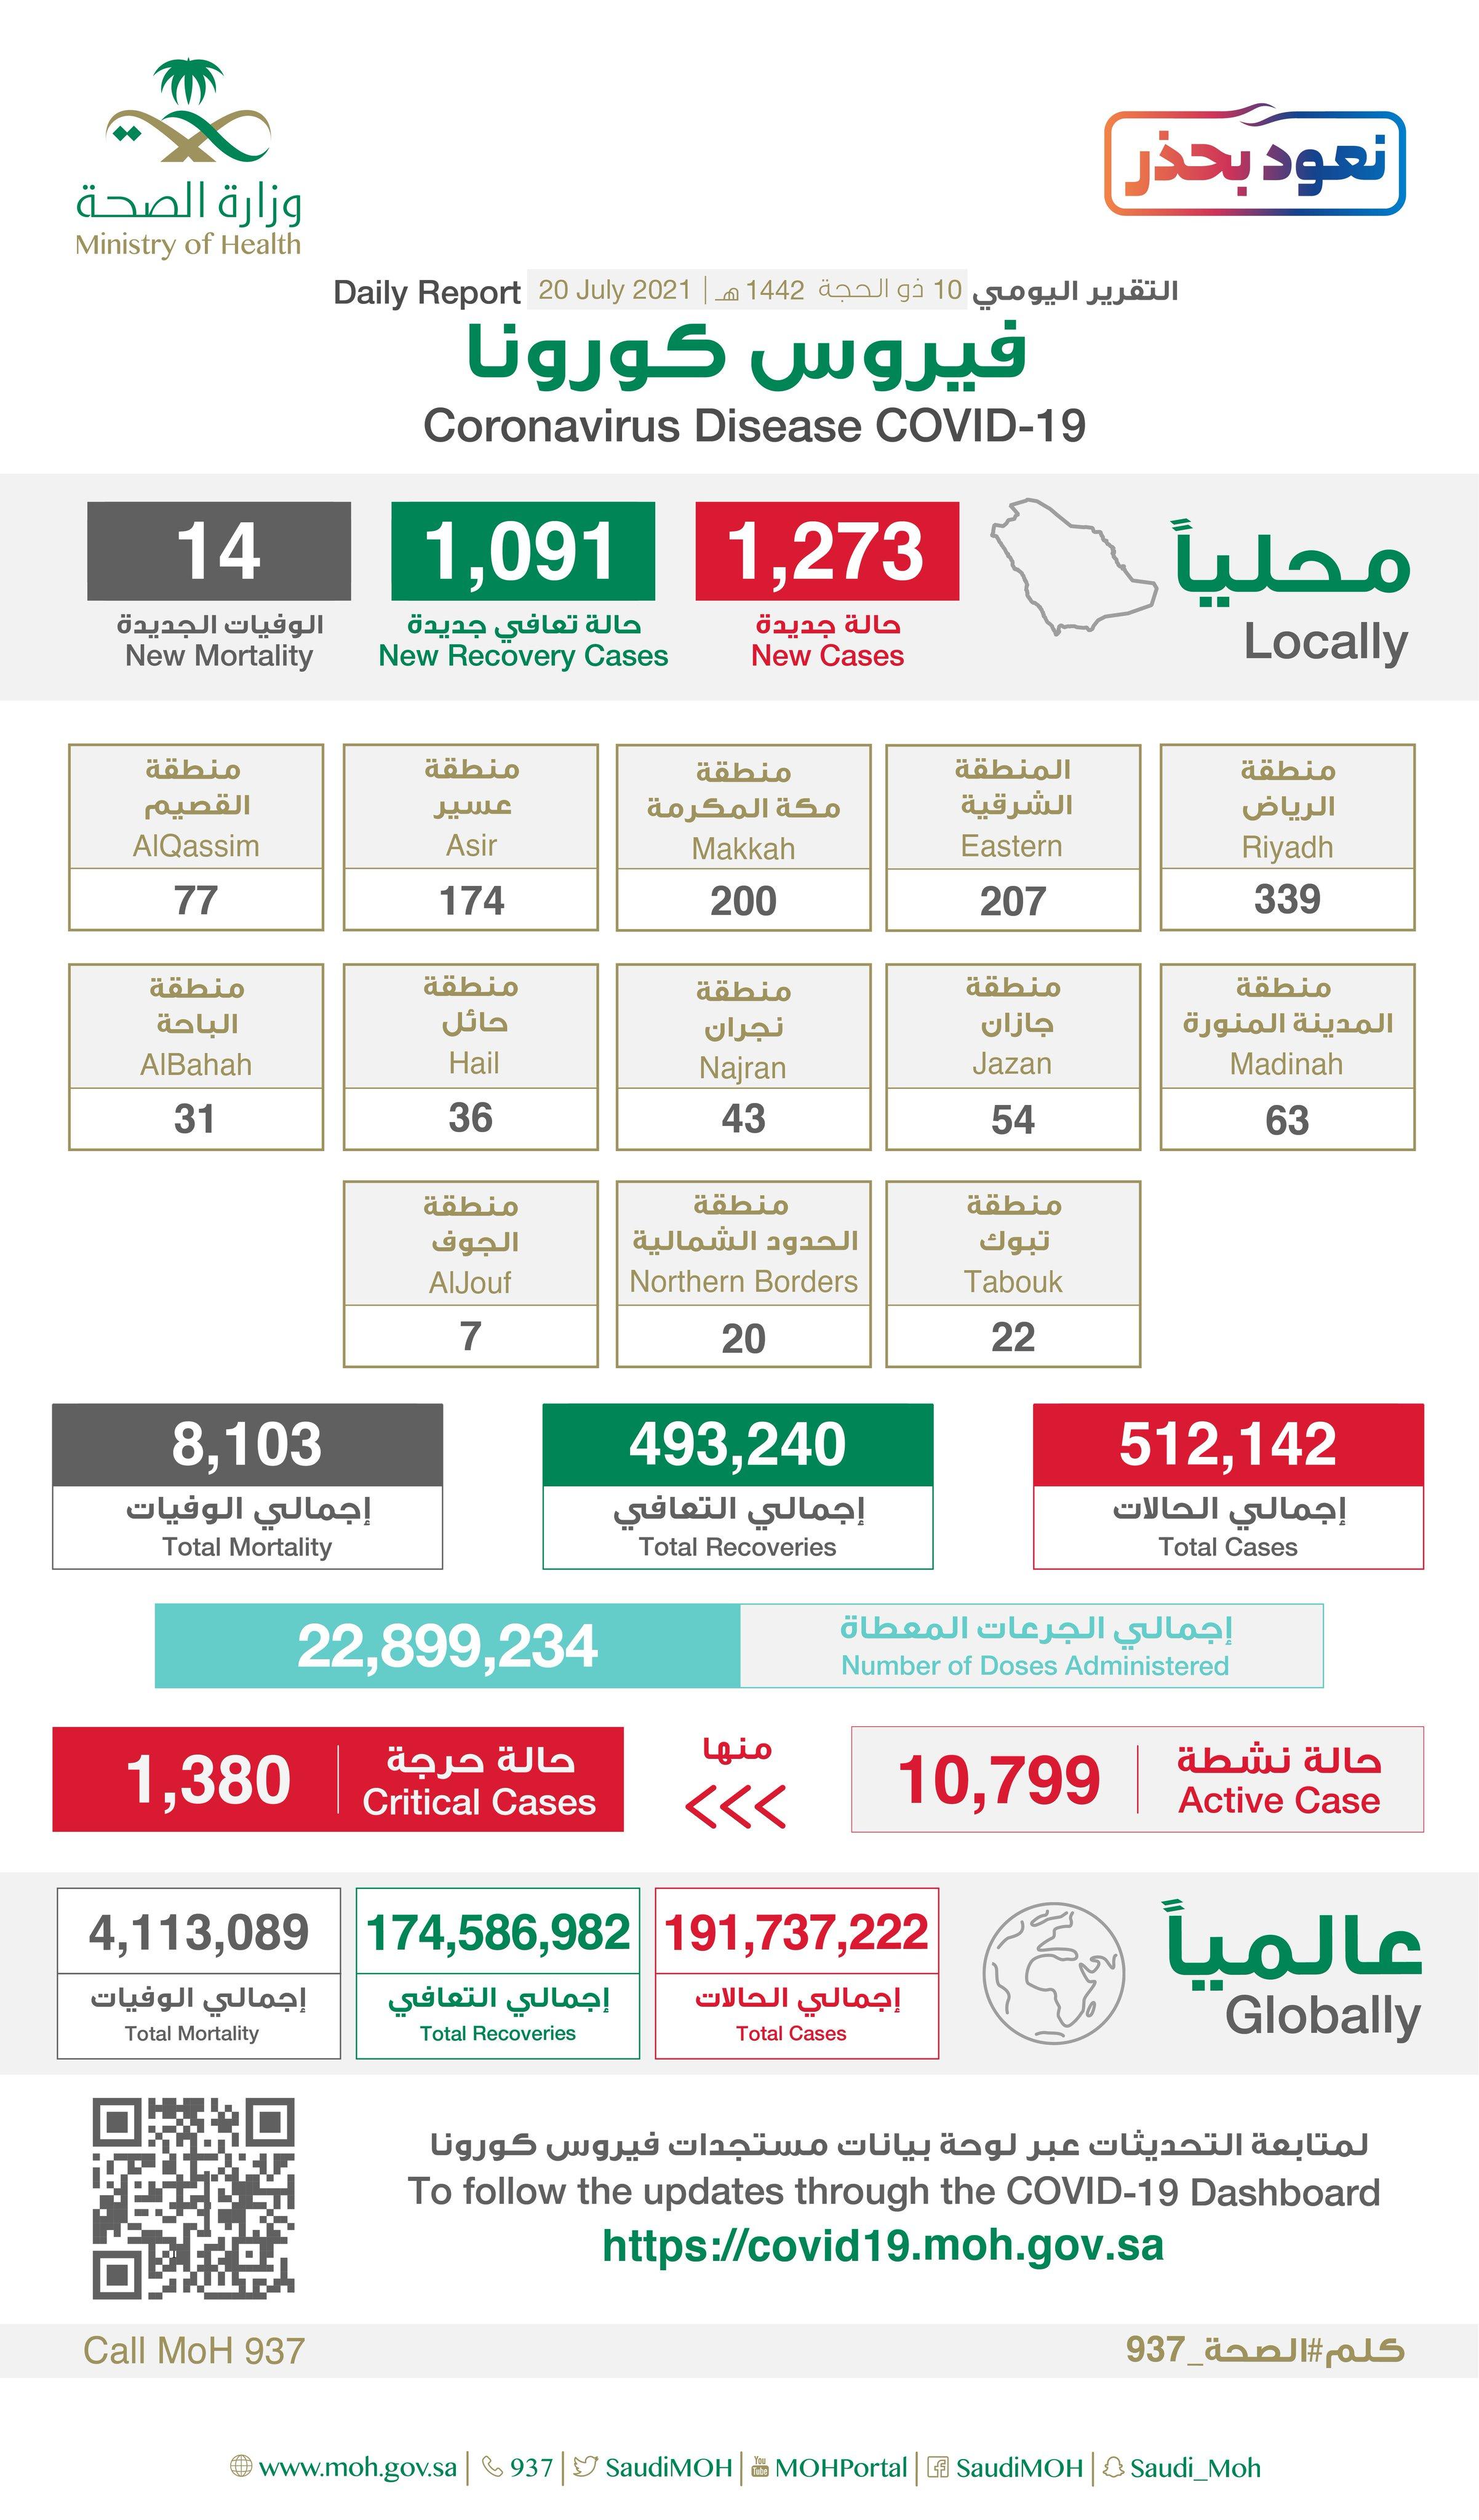 Saudi Arabia Coronavirus : Total Cases : 512,142 , New Cases :1,273, Cured : 493,240 , Deaths: 8,103 , Active Cases : 10,799